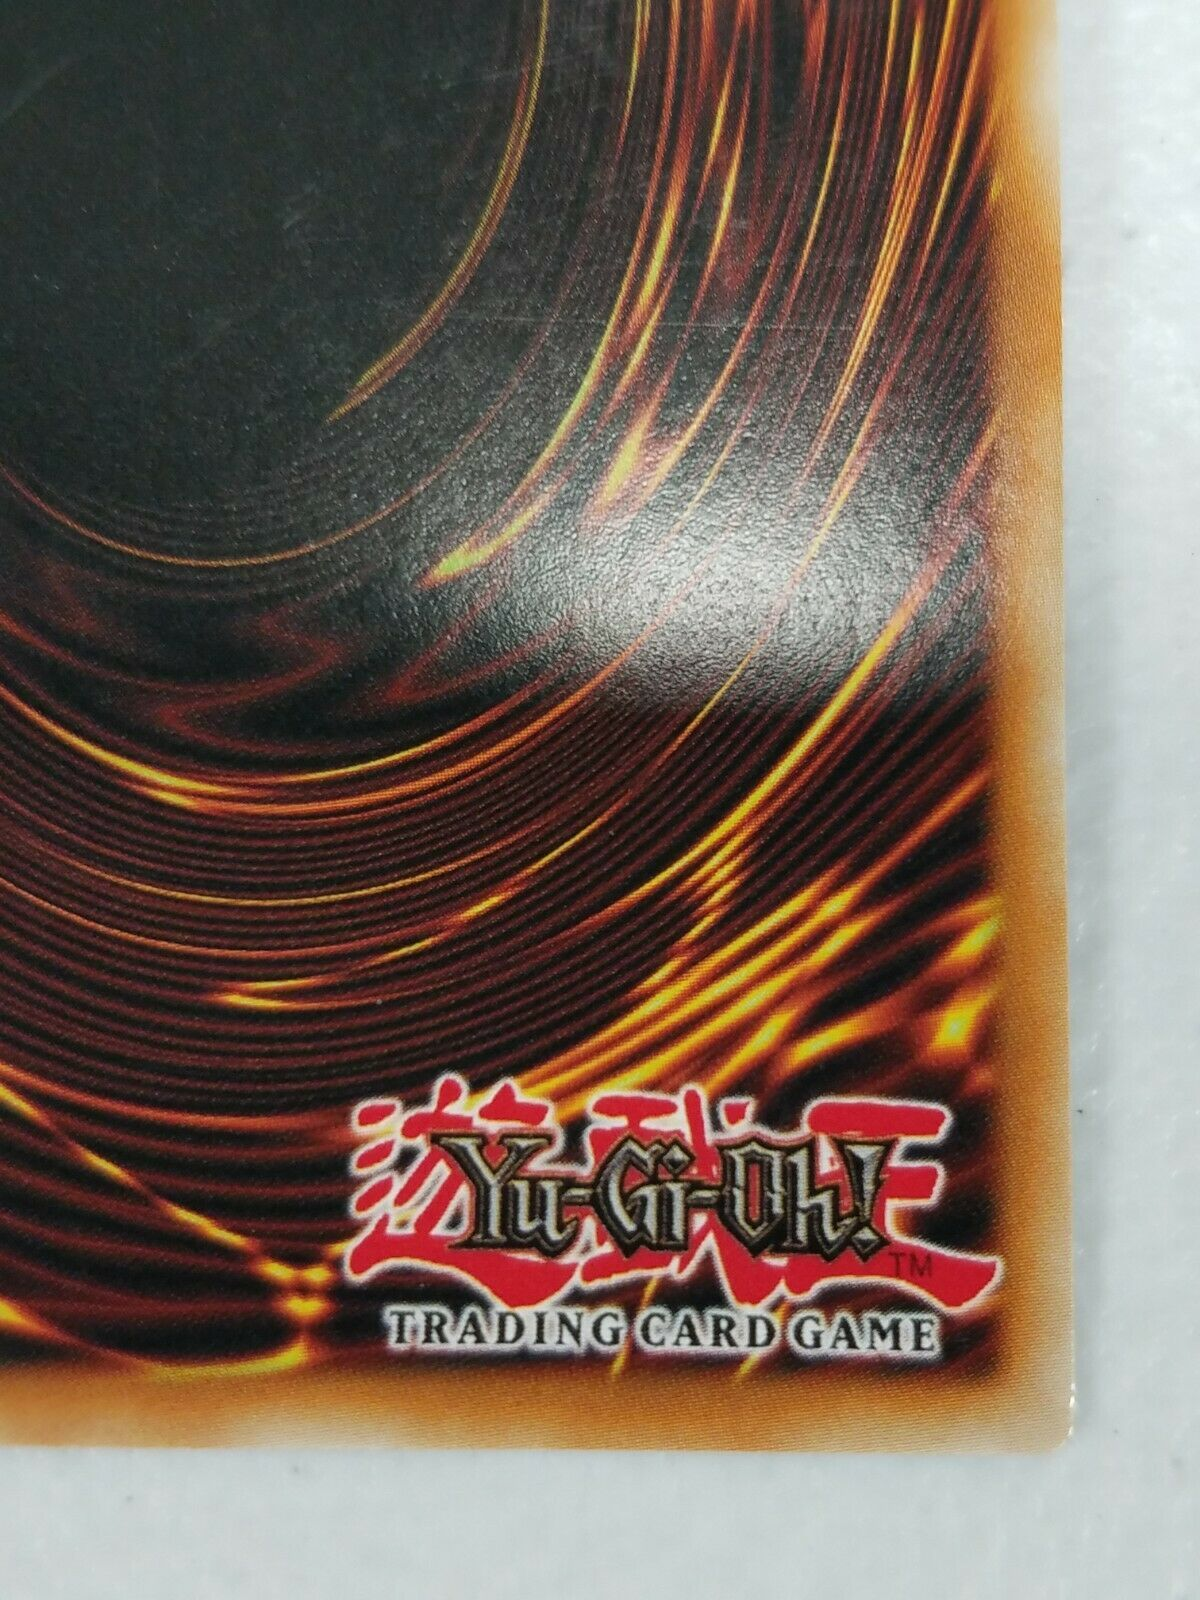 Yu-gi-oh! Trading Card Game - Prediction Princess Tarotrei - Common - 1st Ed.